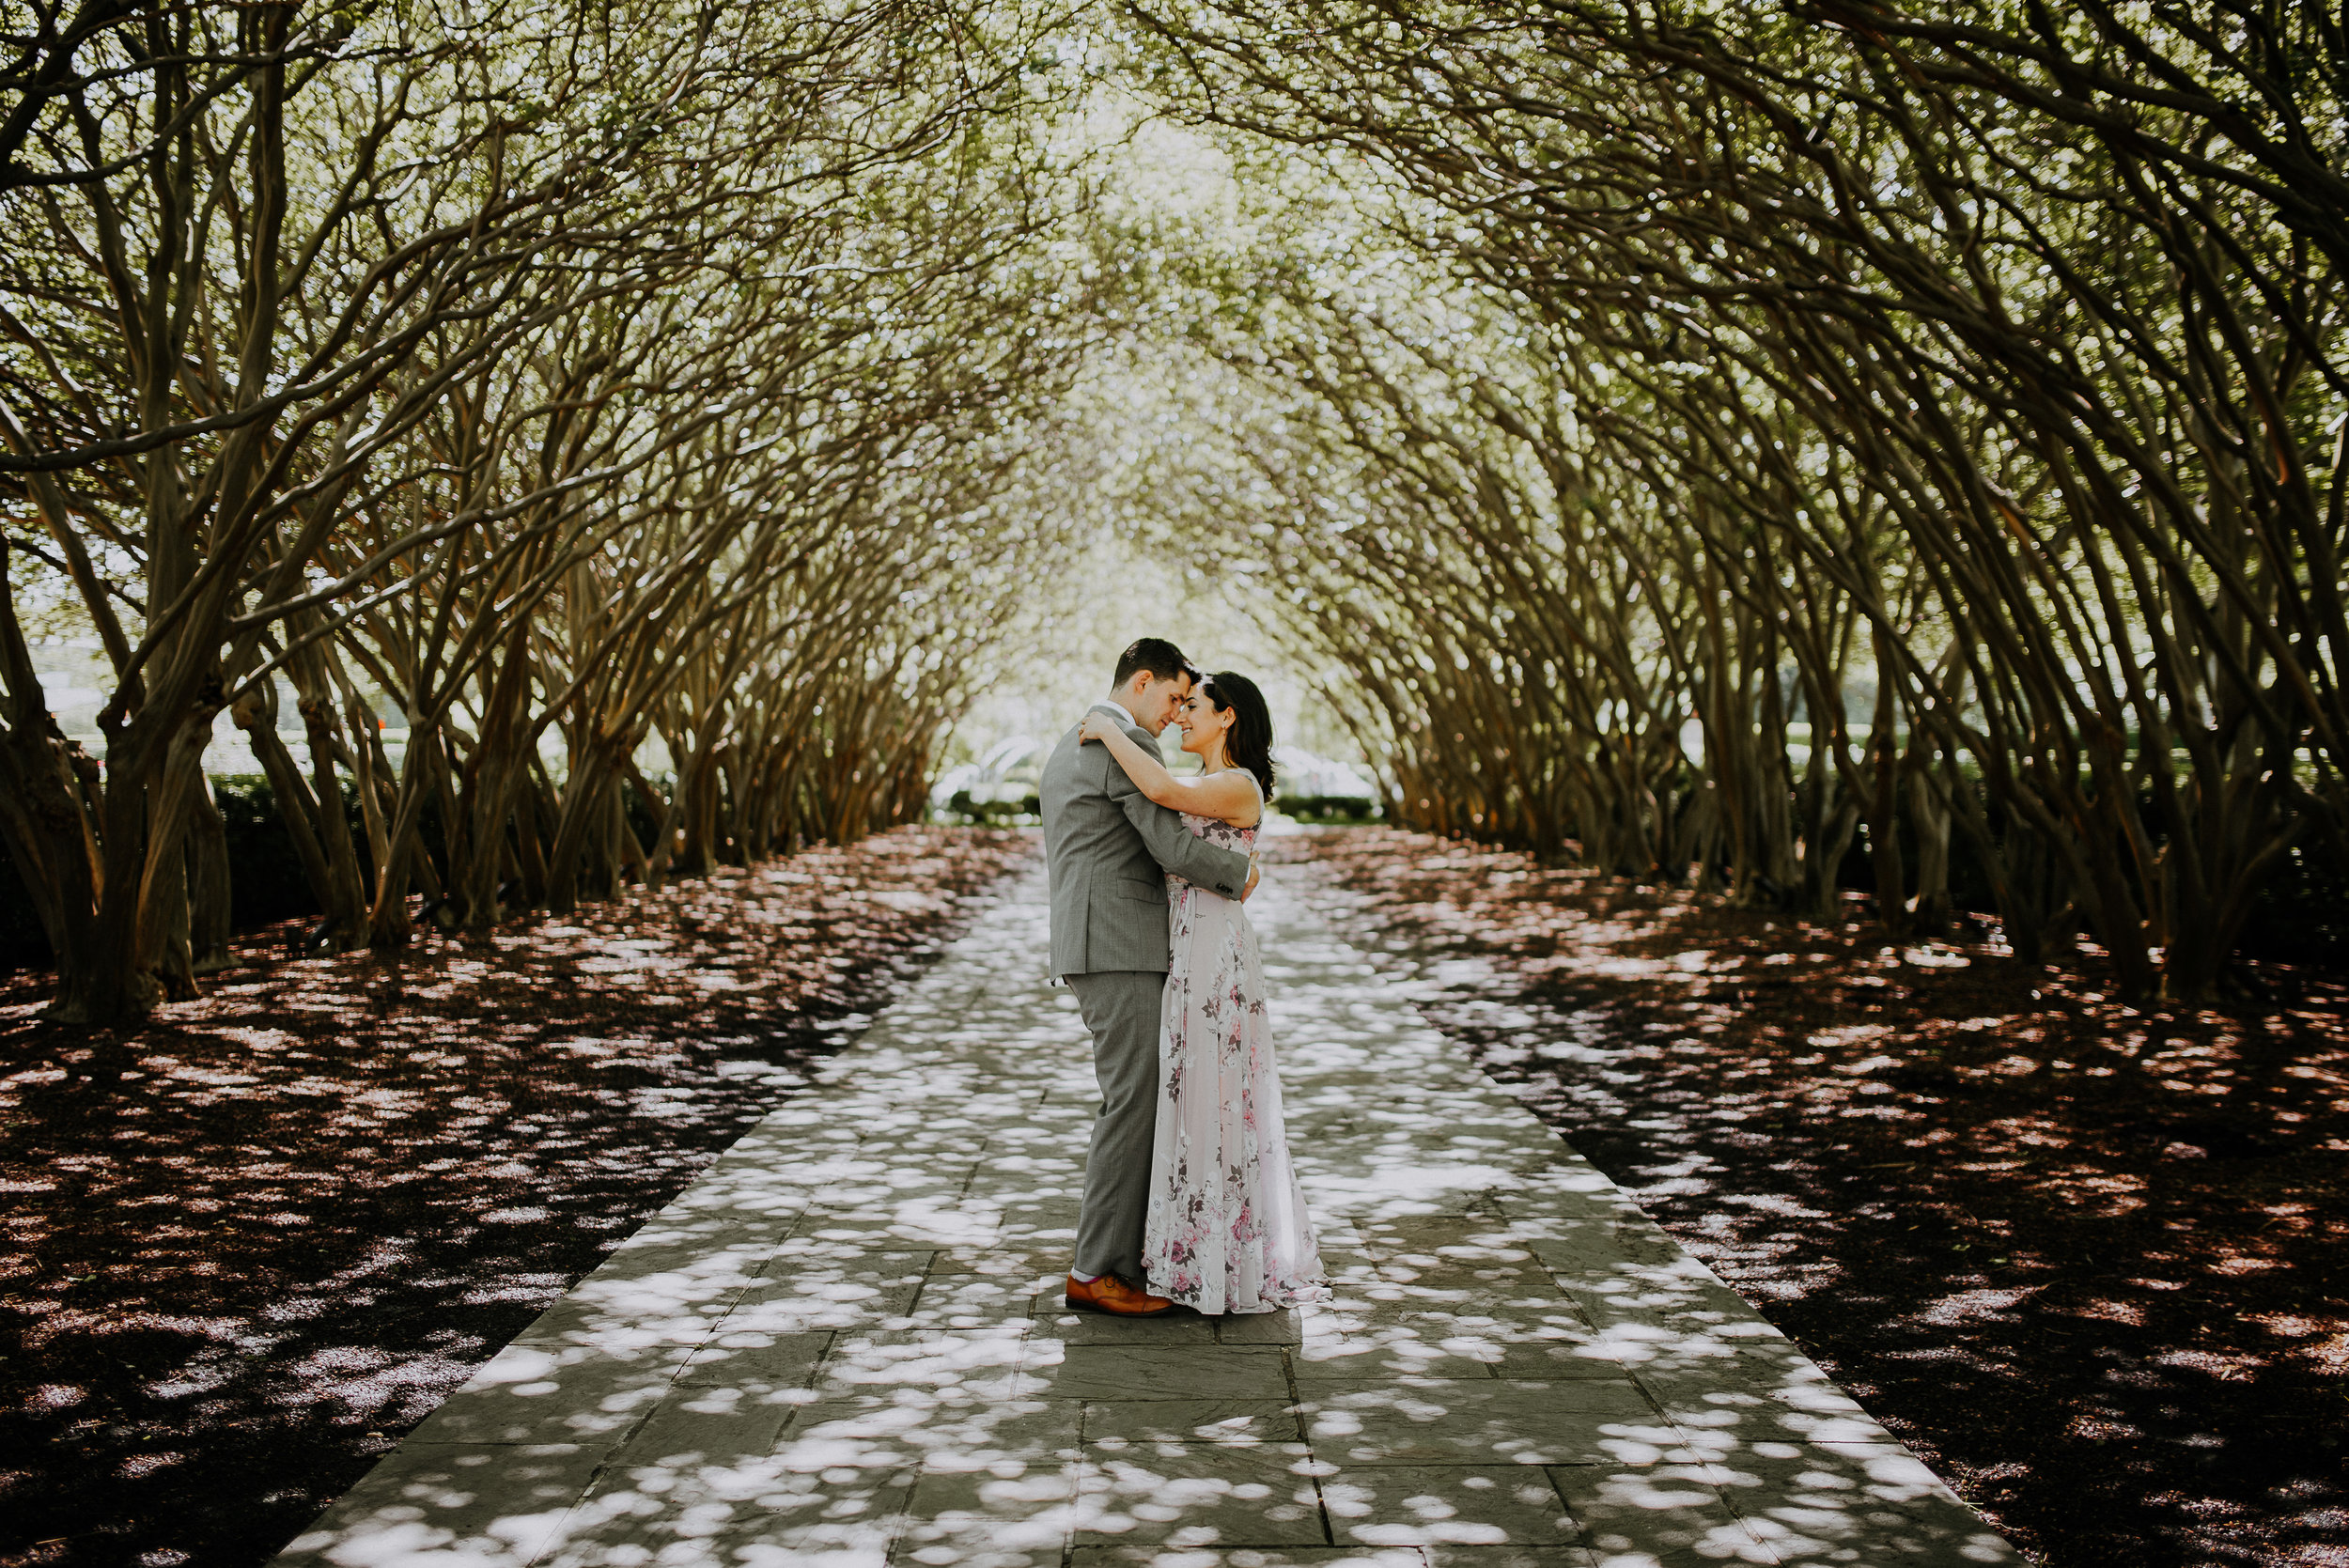 Dallas-fort-worth-wedding-photographer-dallas-arboretum-intimate-wedding-dallas-texas-28